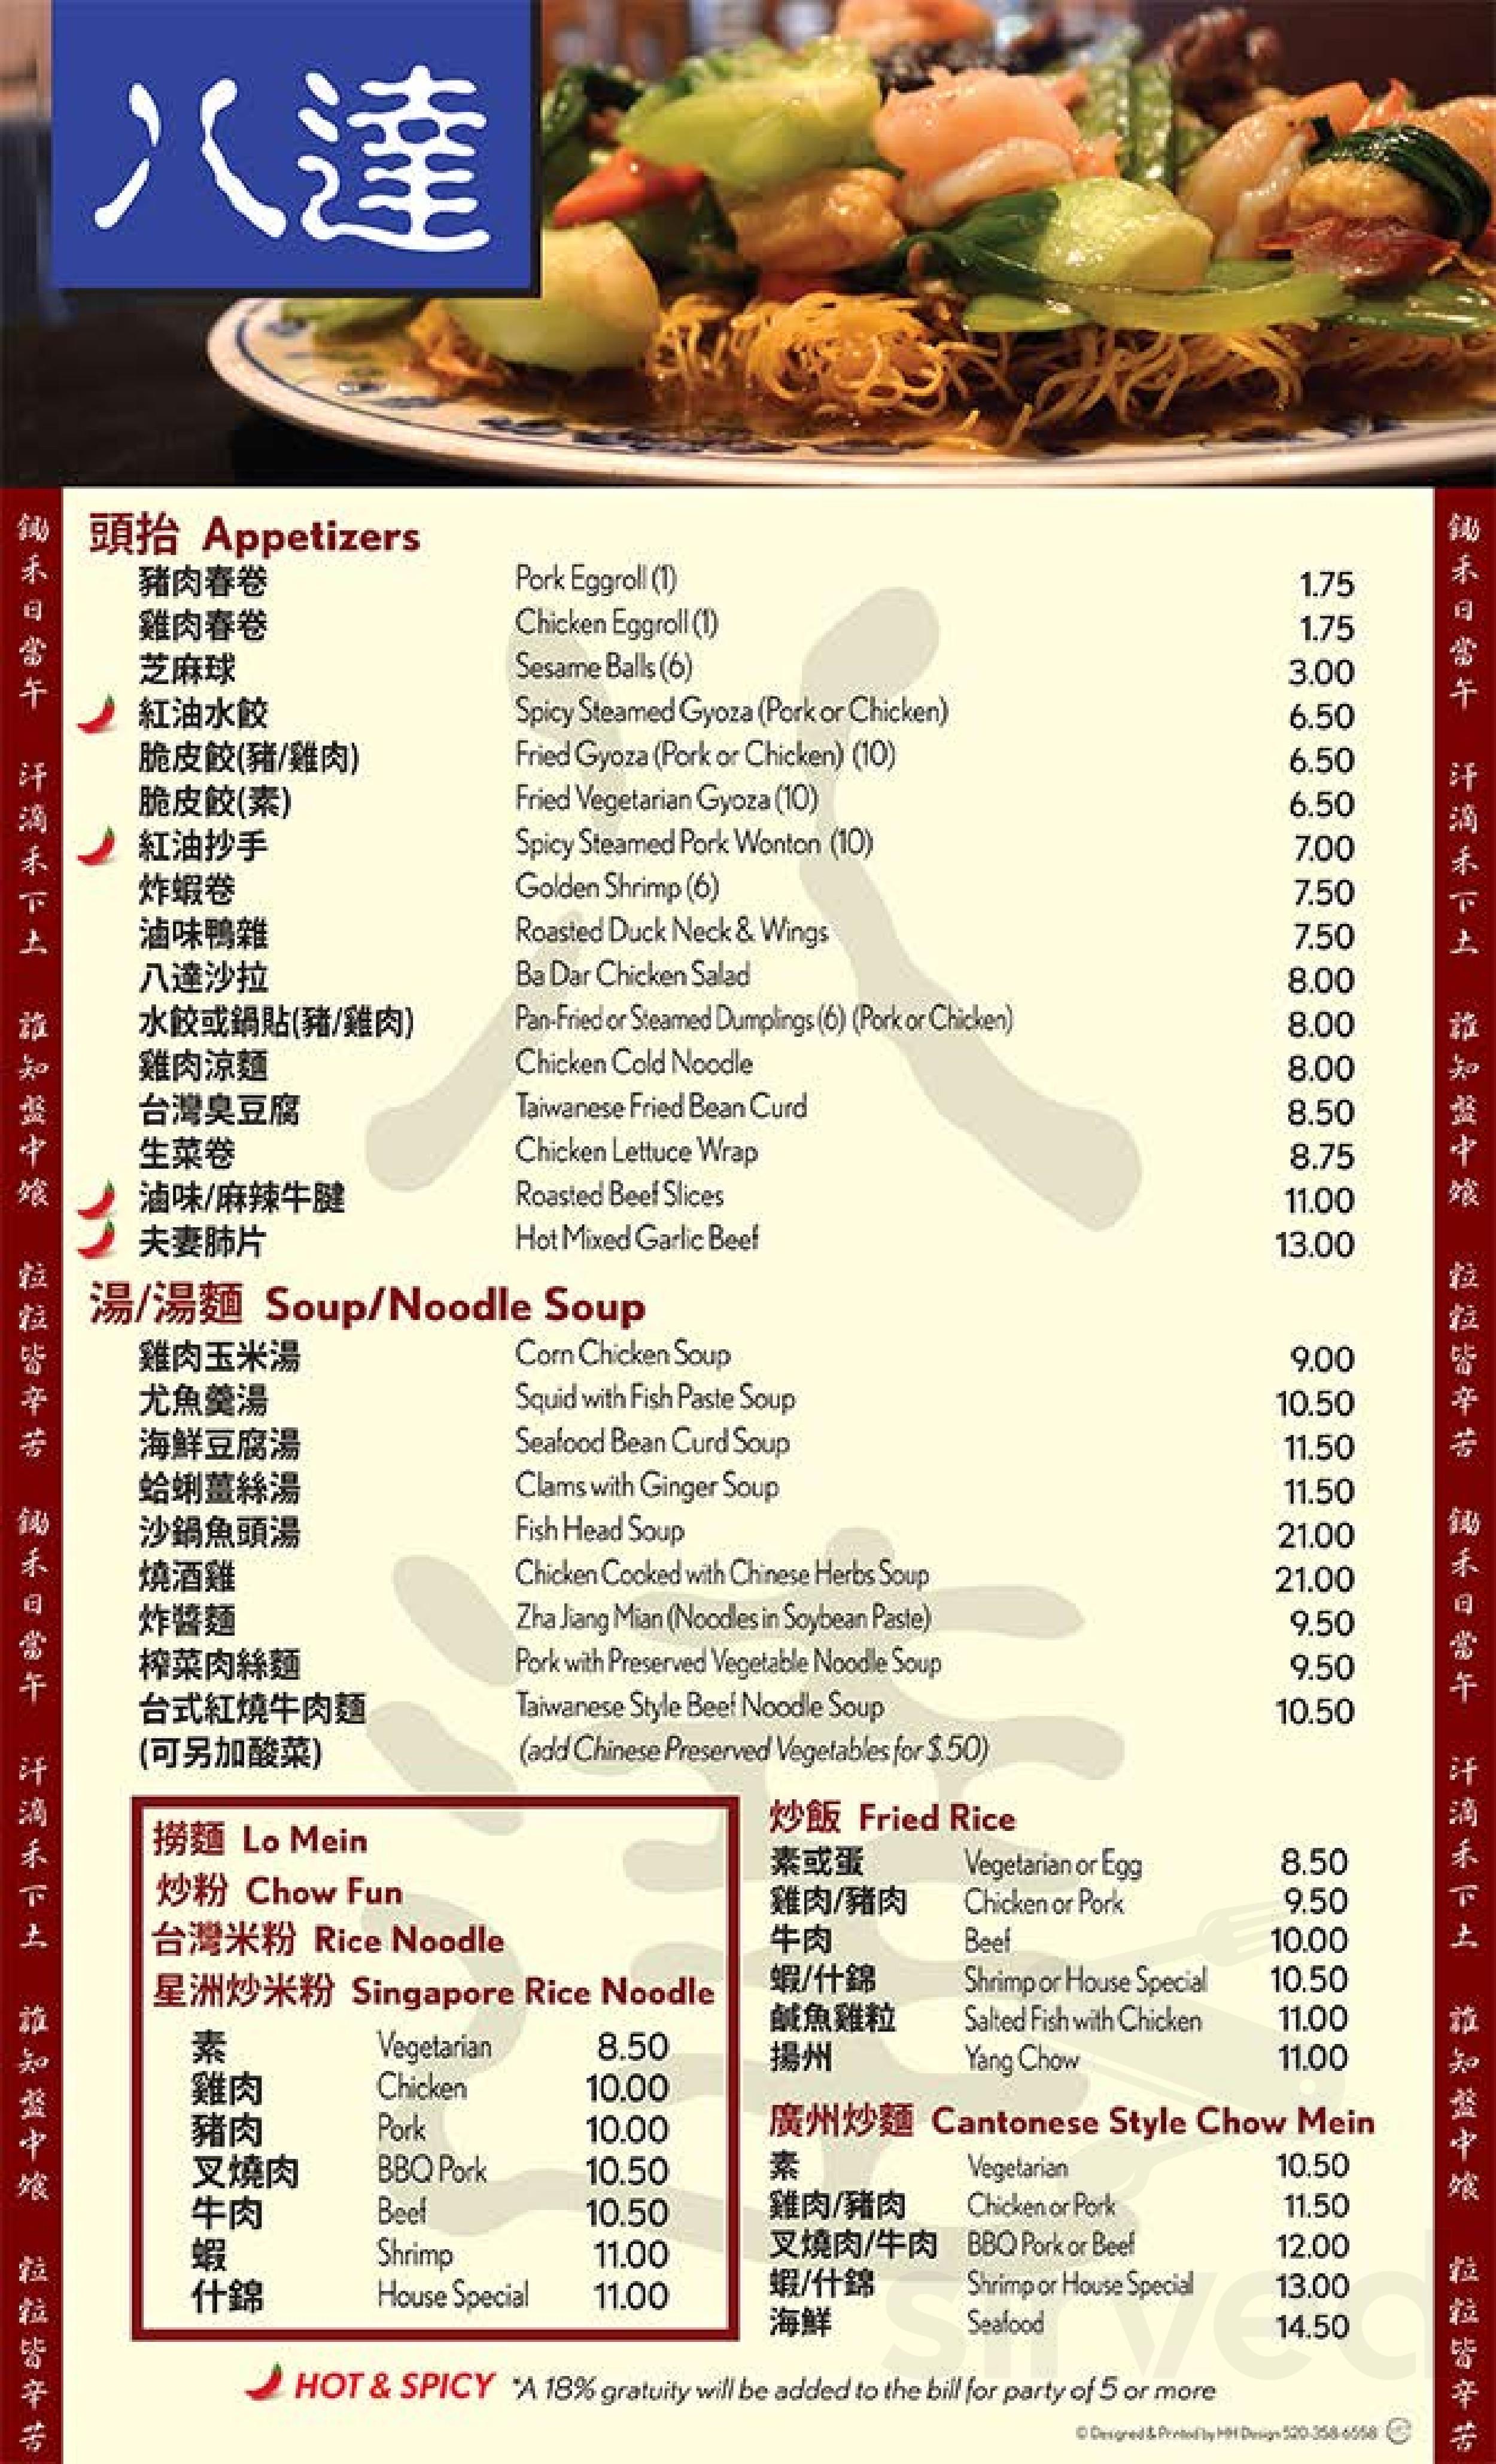 Menu For Ba Dar Chinese Restaurant In Tucson Arizona